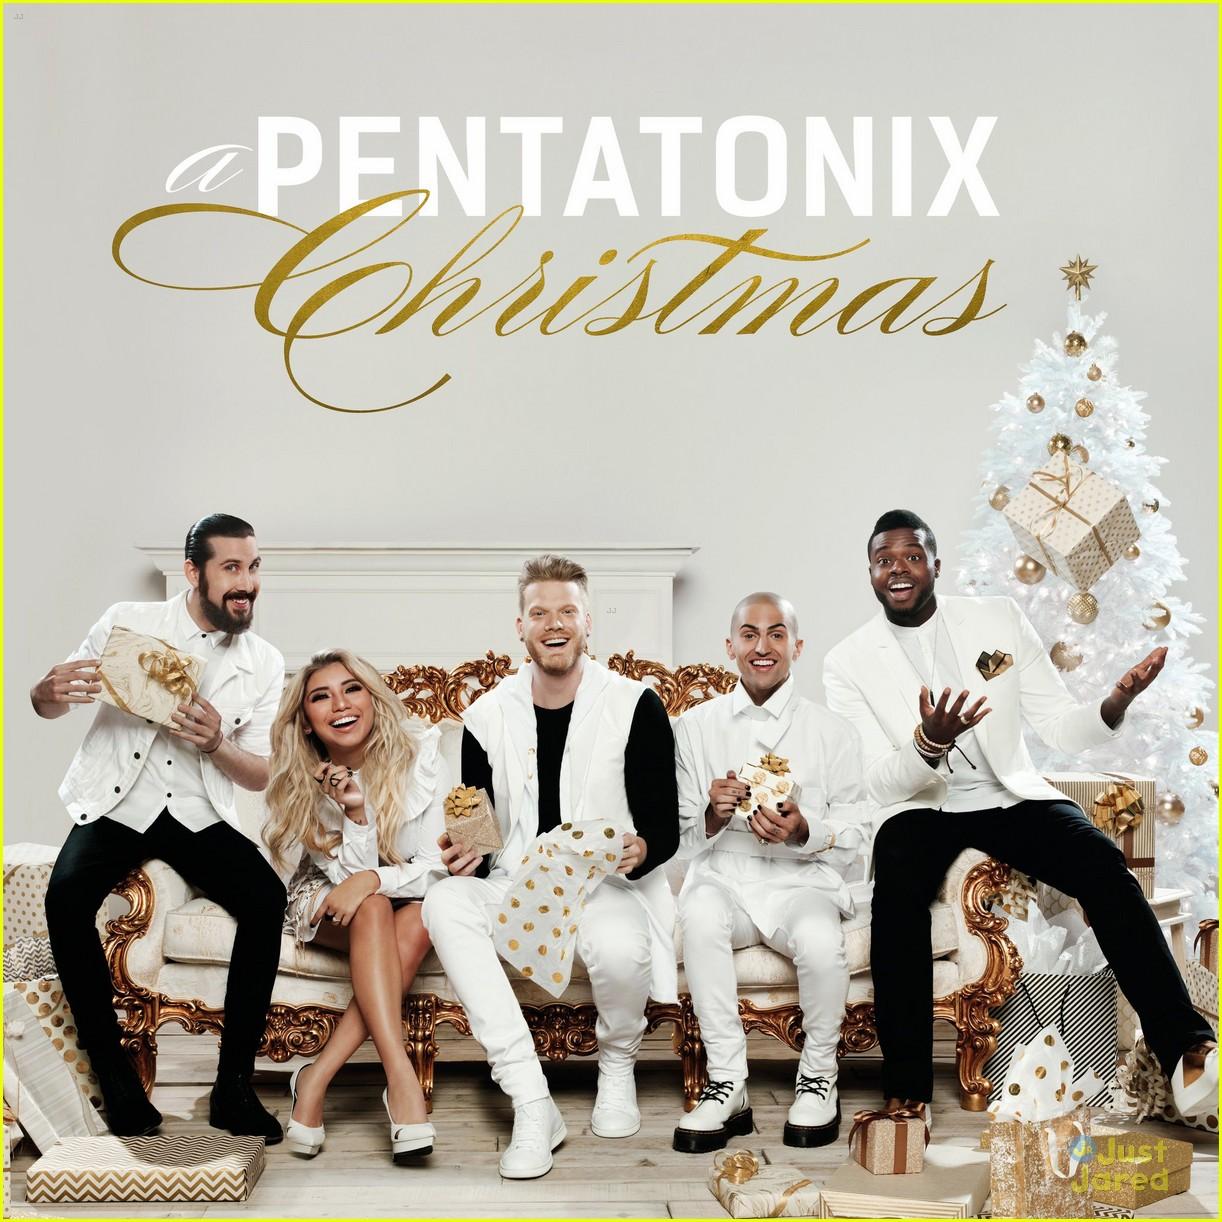 pentatonix christmas album cover track list 01